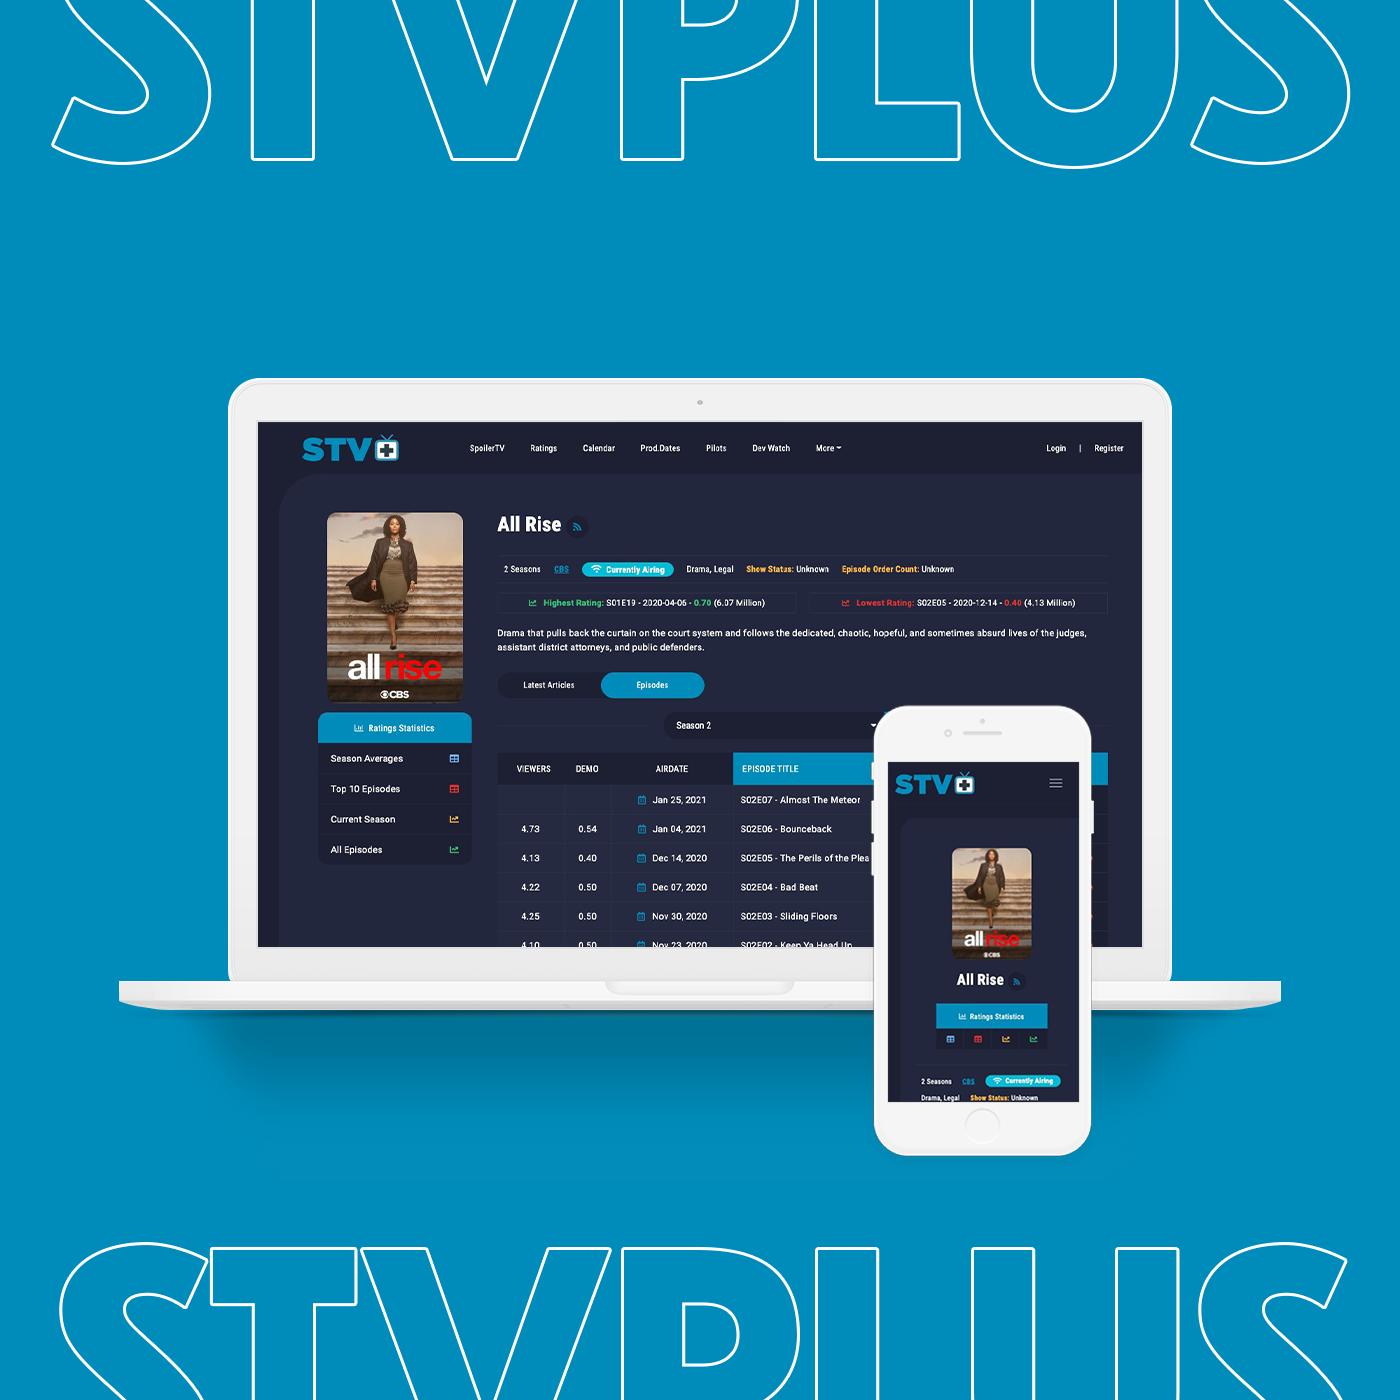 STVPlus